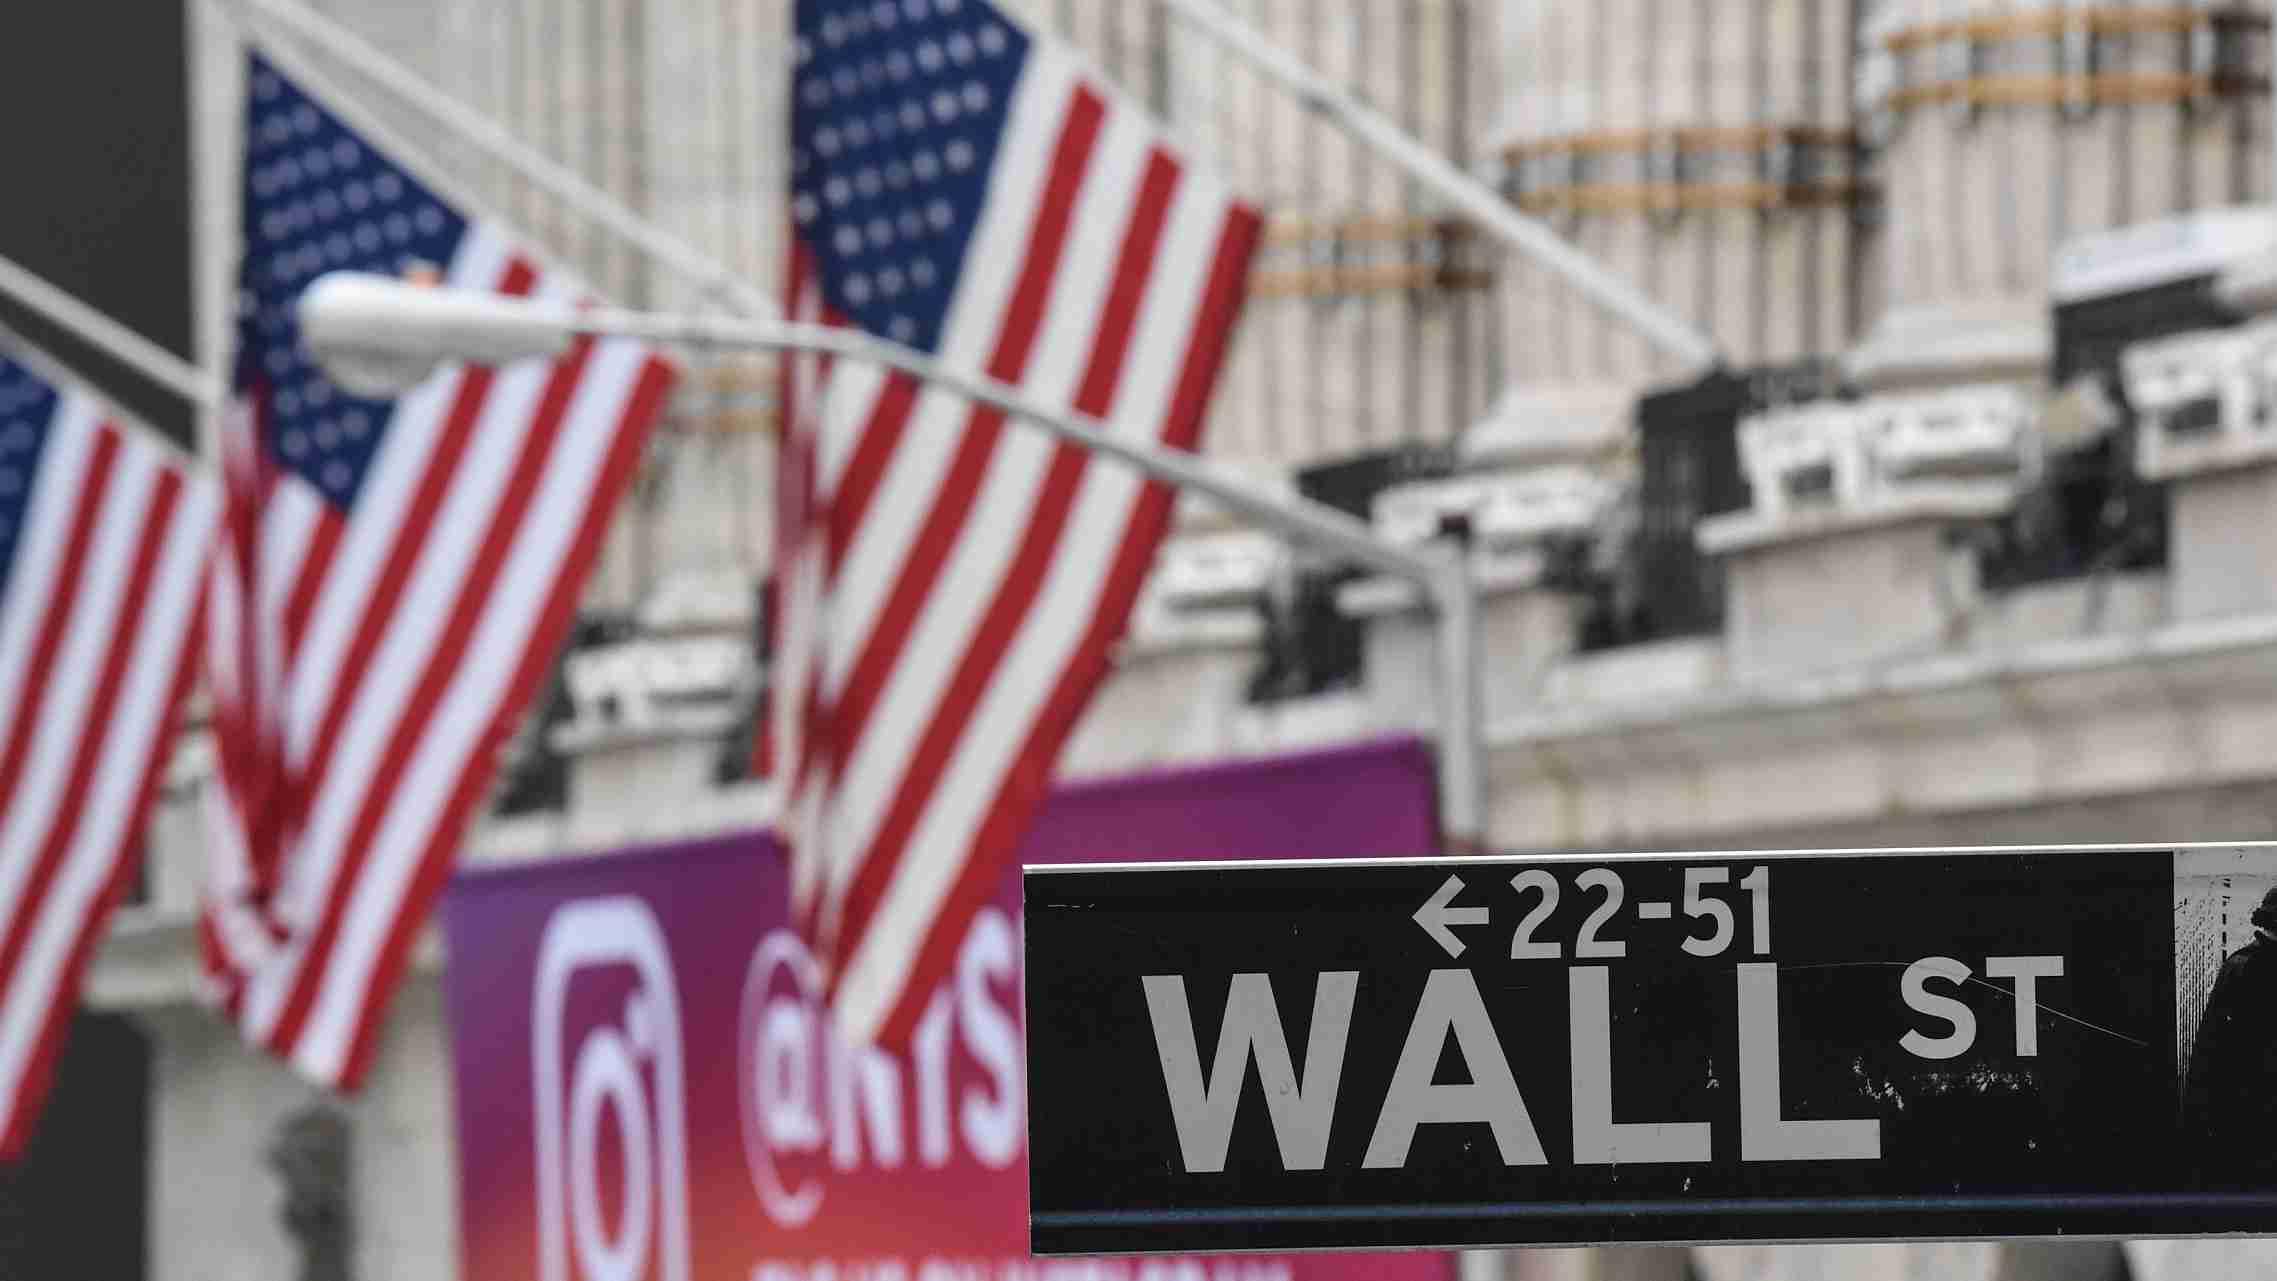 Wall Street 'will bounce back,' Fed should cut rates again: Trump